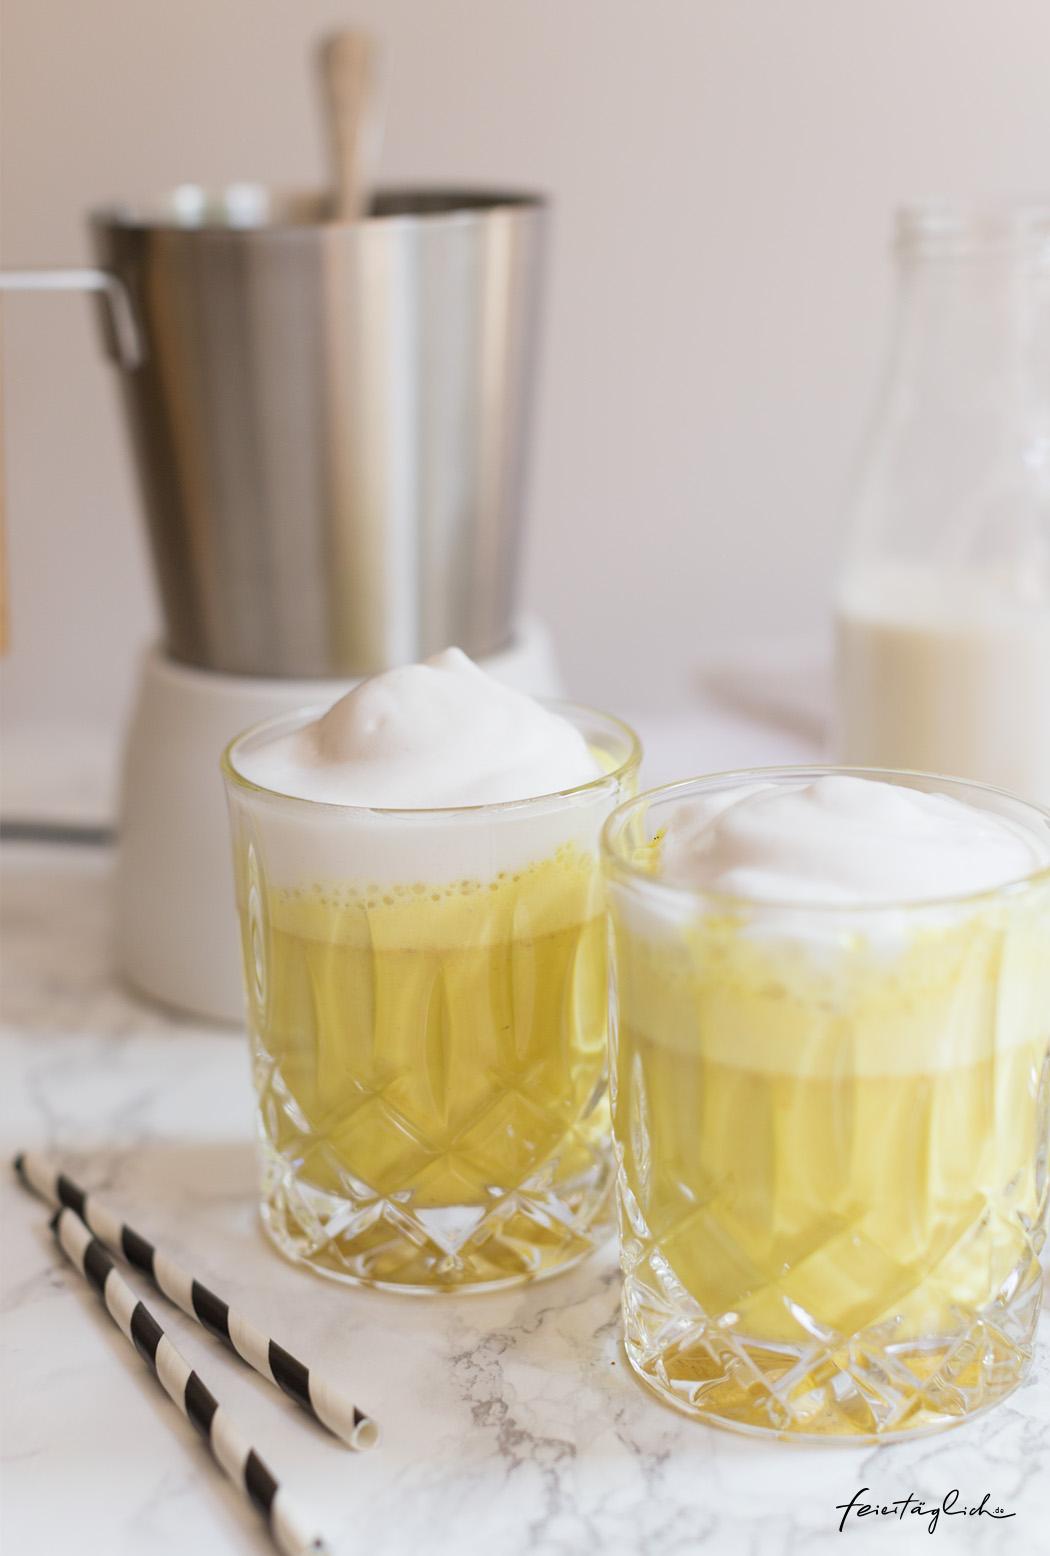 Goldene Milch – (Iced)-Kurkuma-Latte, Rezept für selbst gemachte KurkumaPaste